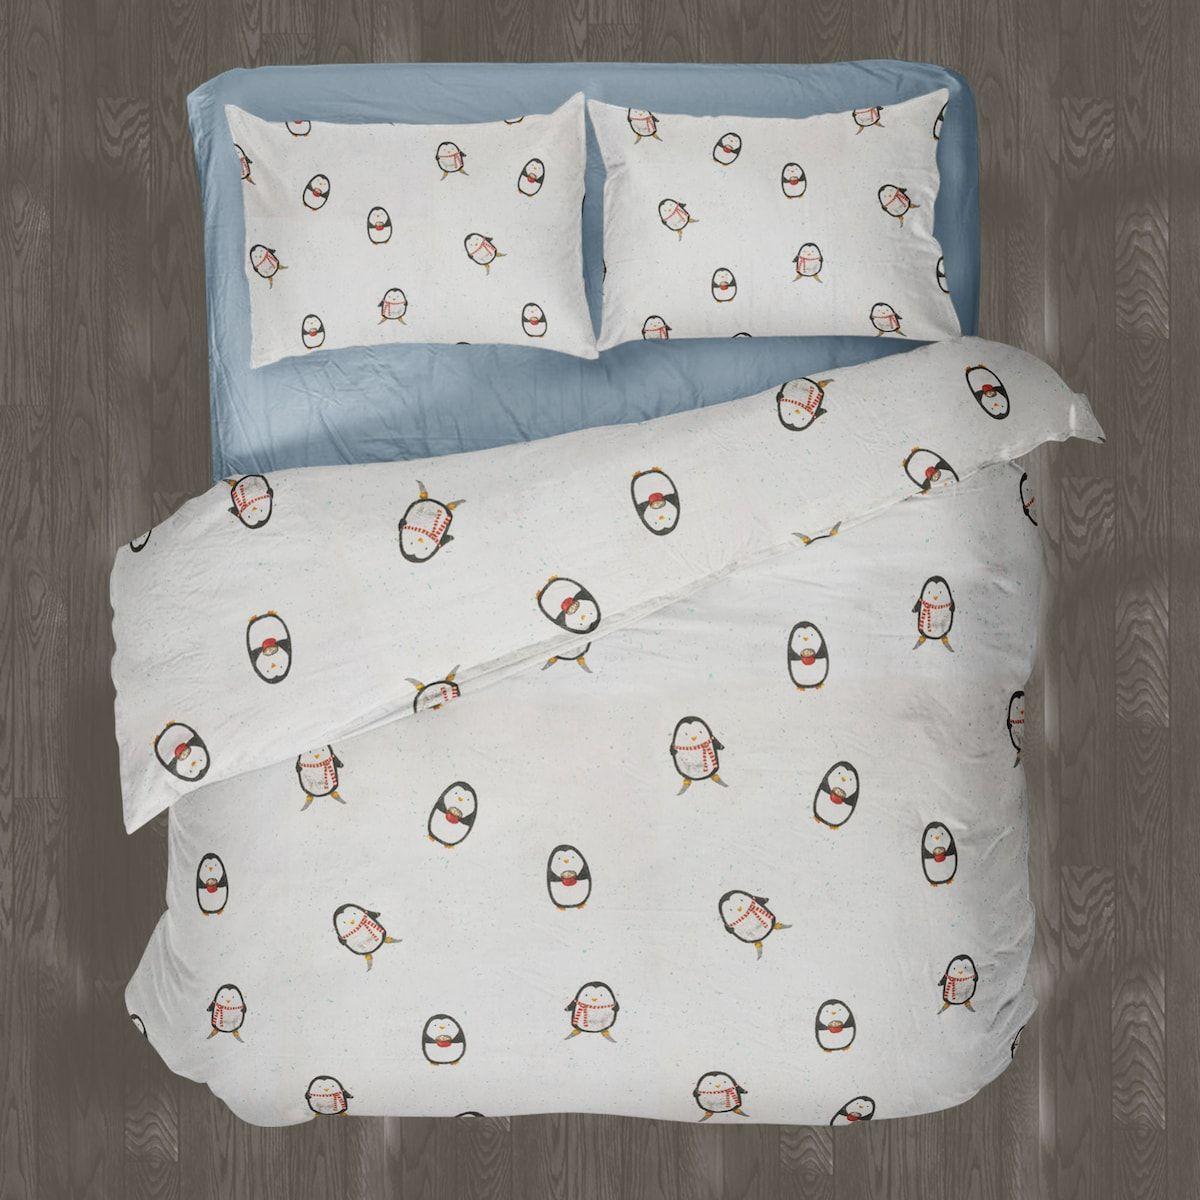 Linen Chest Winter Penguins Flannel Sheet Set And Duvet Cover Set